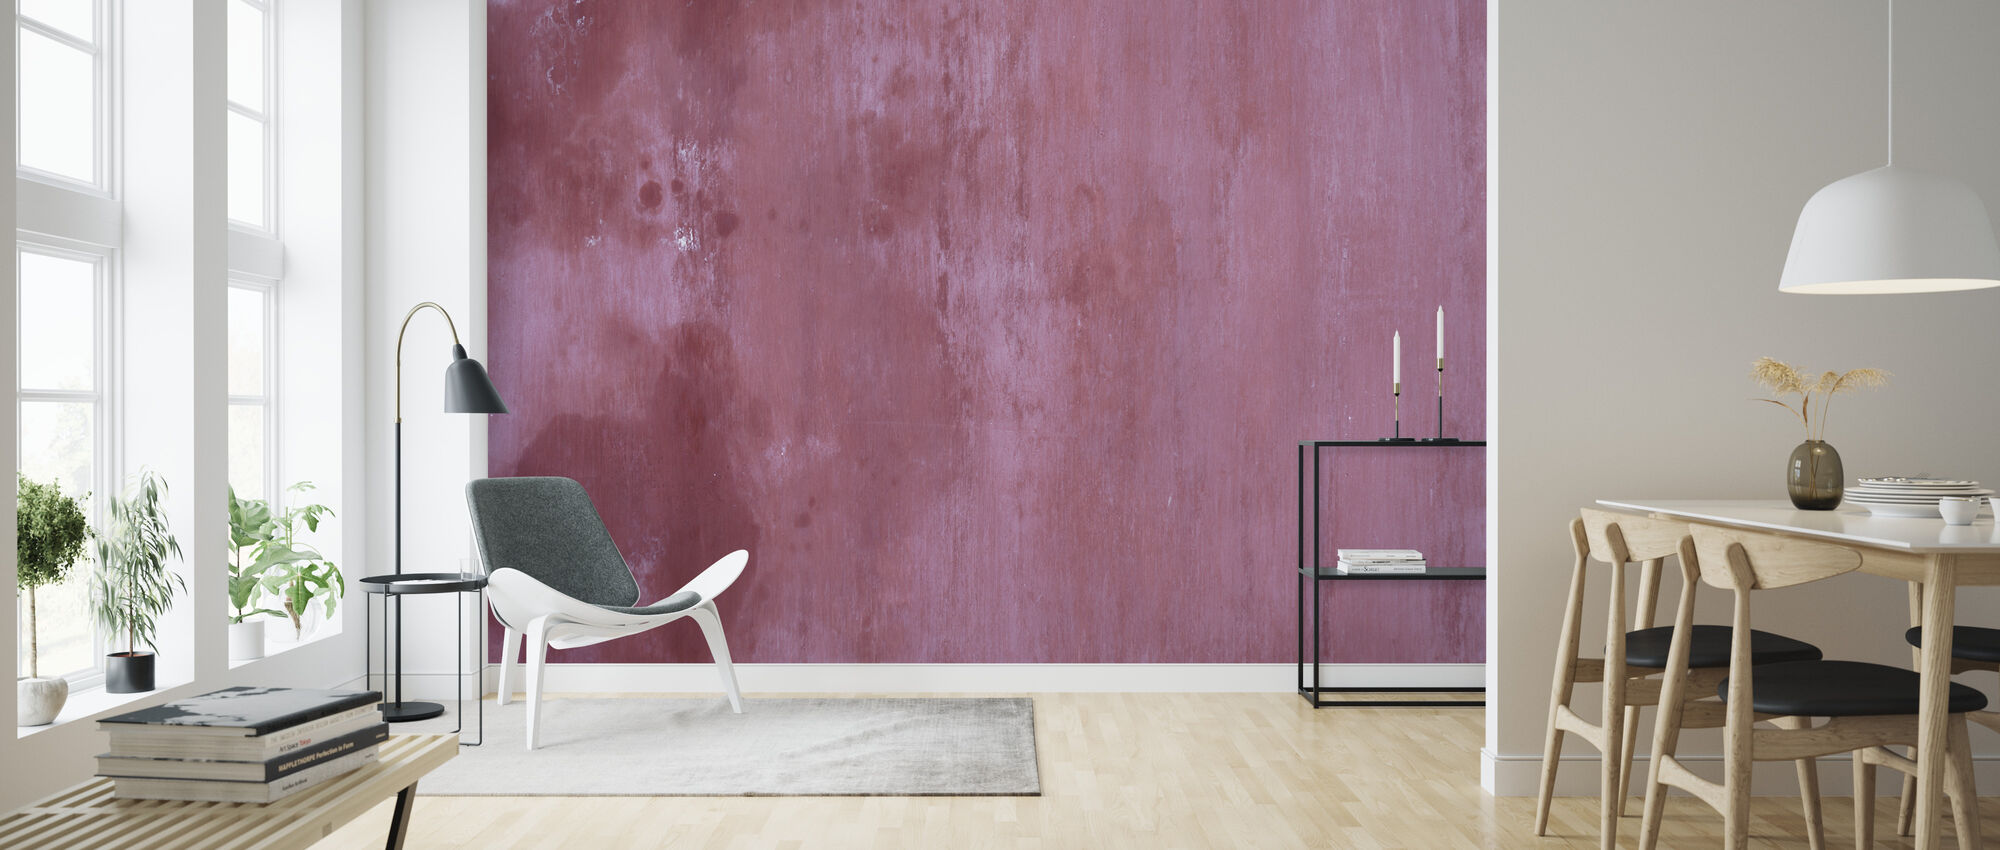 14th Century Wall - Wallpaper - Living Room